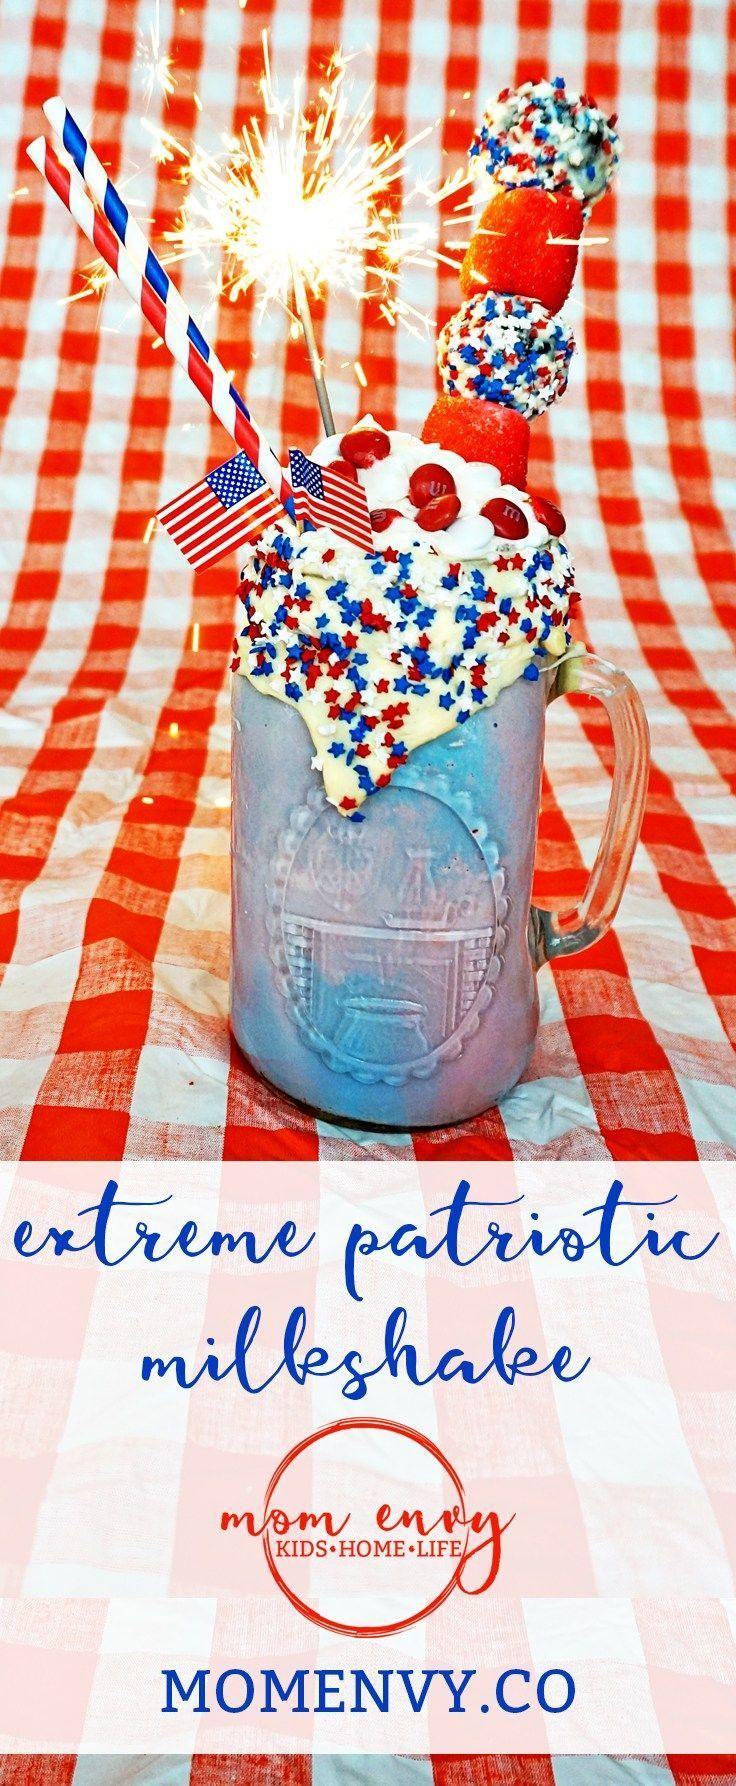 Extreme Patriotic Milkshake #labordaydesserts Memorial Day Milkshake. Extreme Patriotic Milkshake. Fourth of July Milkshake. Labor Day Milkshake. Red, white, and blue milkshake. Memorial Day dessert recipe. Fourth of July dessert recipe. Labor day dessert recipe. Red, White, and Blue recipe. Mom Envy. #labordaydesserts Extreme Patriotic Milkshake #labordaydesserts Memorial Day Milkshake. Extreme Patriotic Milkshake. Fourth of July Milkshake. Labor Day Milkshake. Red, white, and blue milkshake. M #labordaydesserts